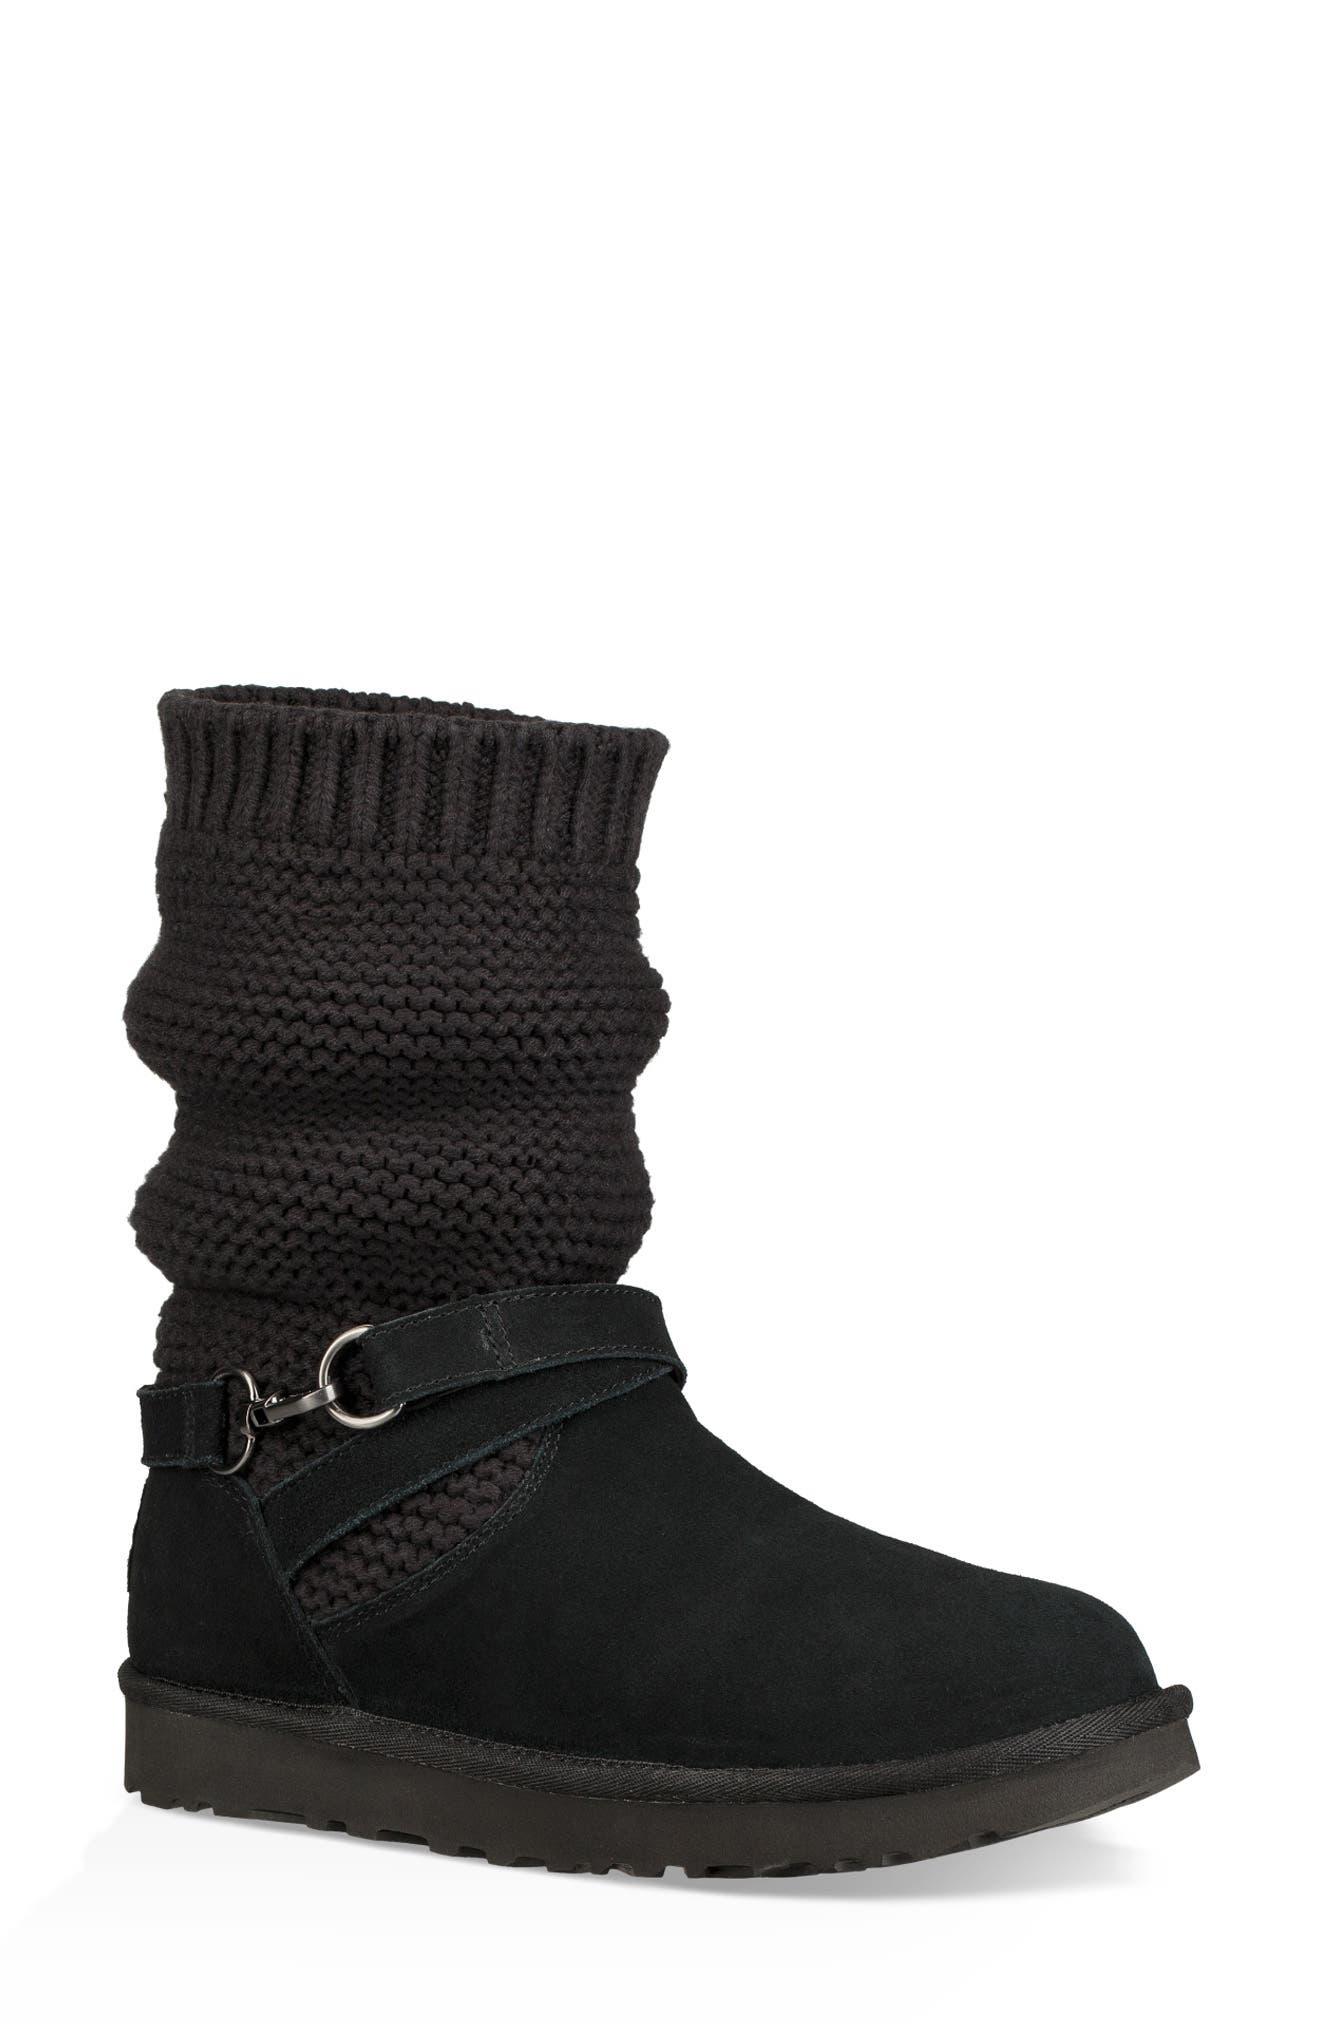 UGGpure<sup>™</sup> Strappy Purl Knit Bootie,                         Main,                         color, BLACK SUEDE